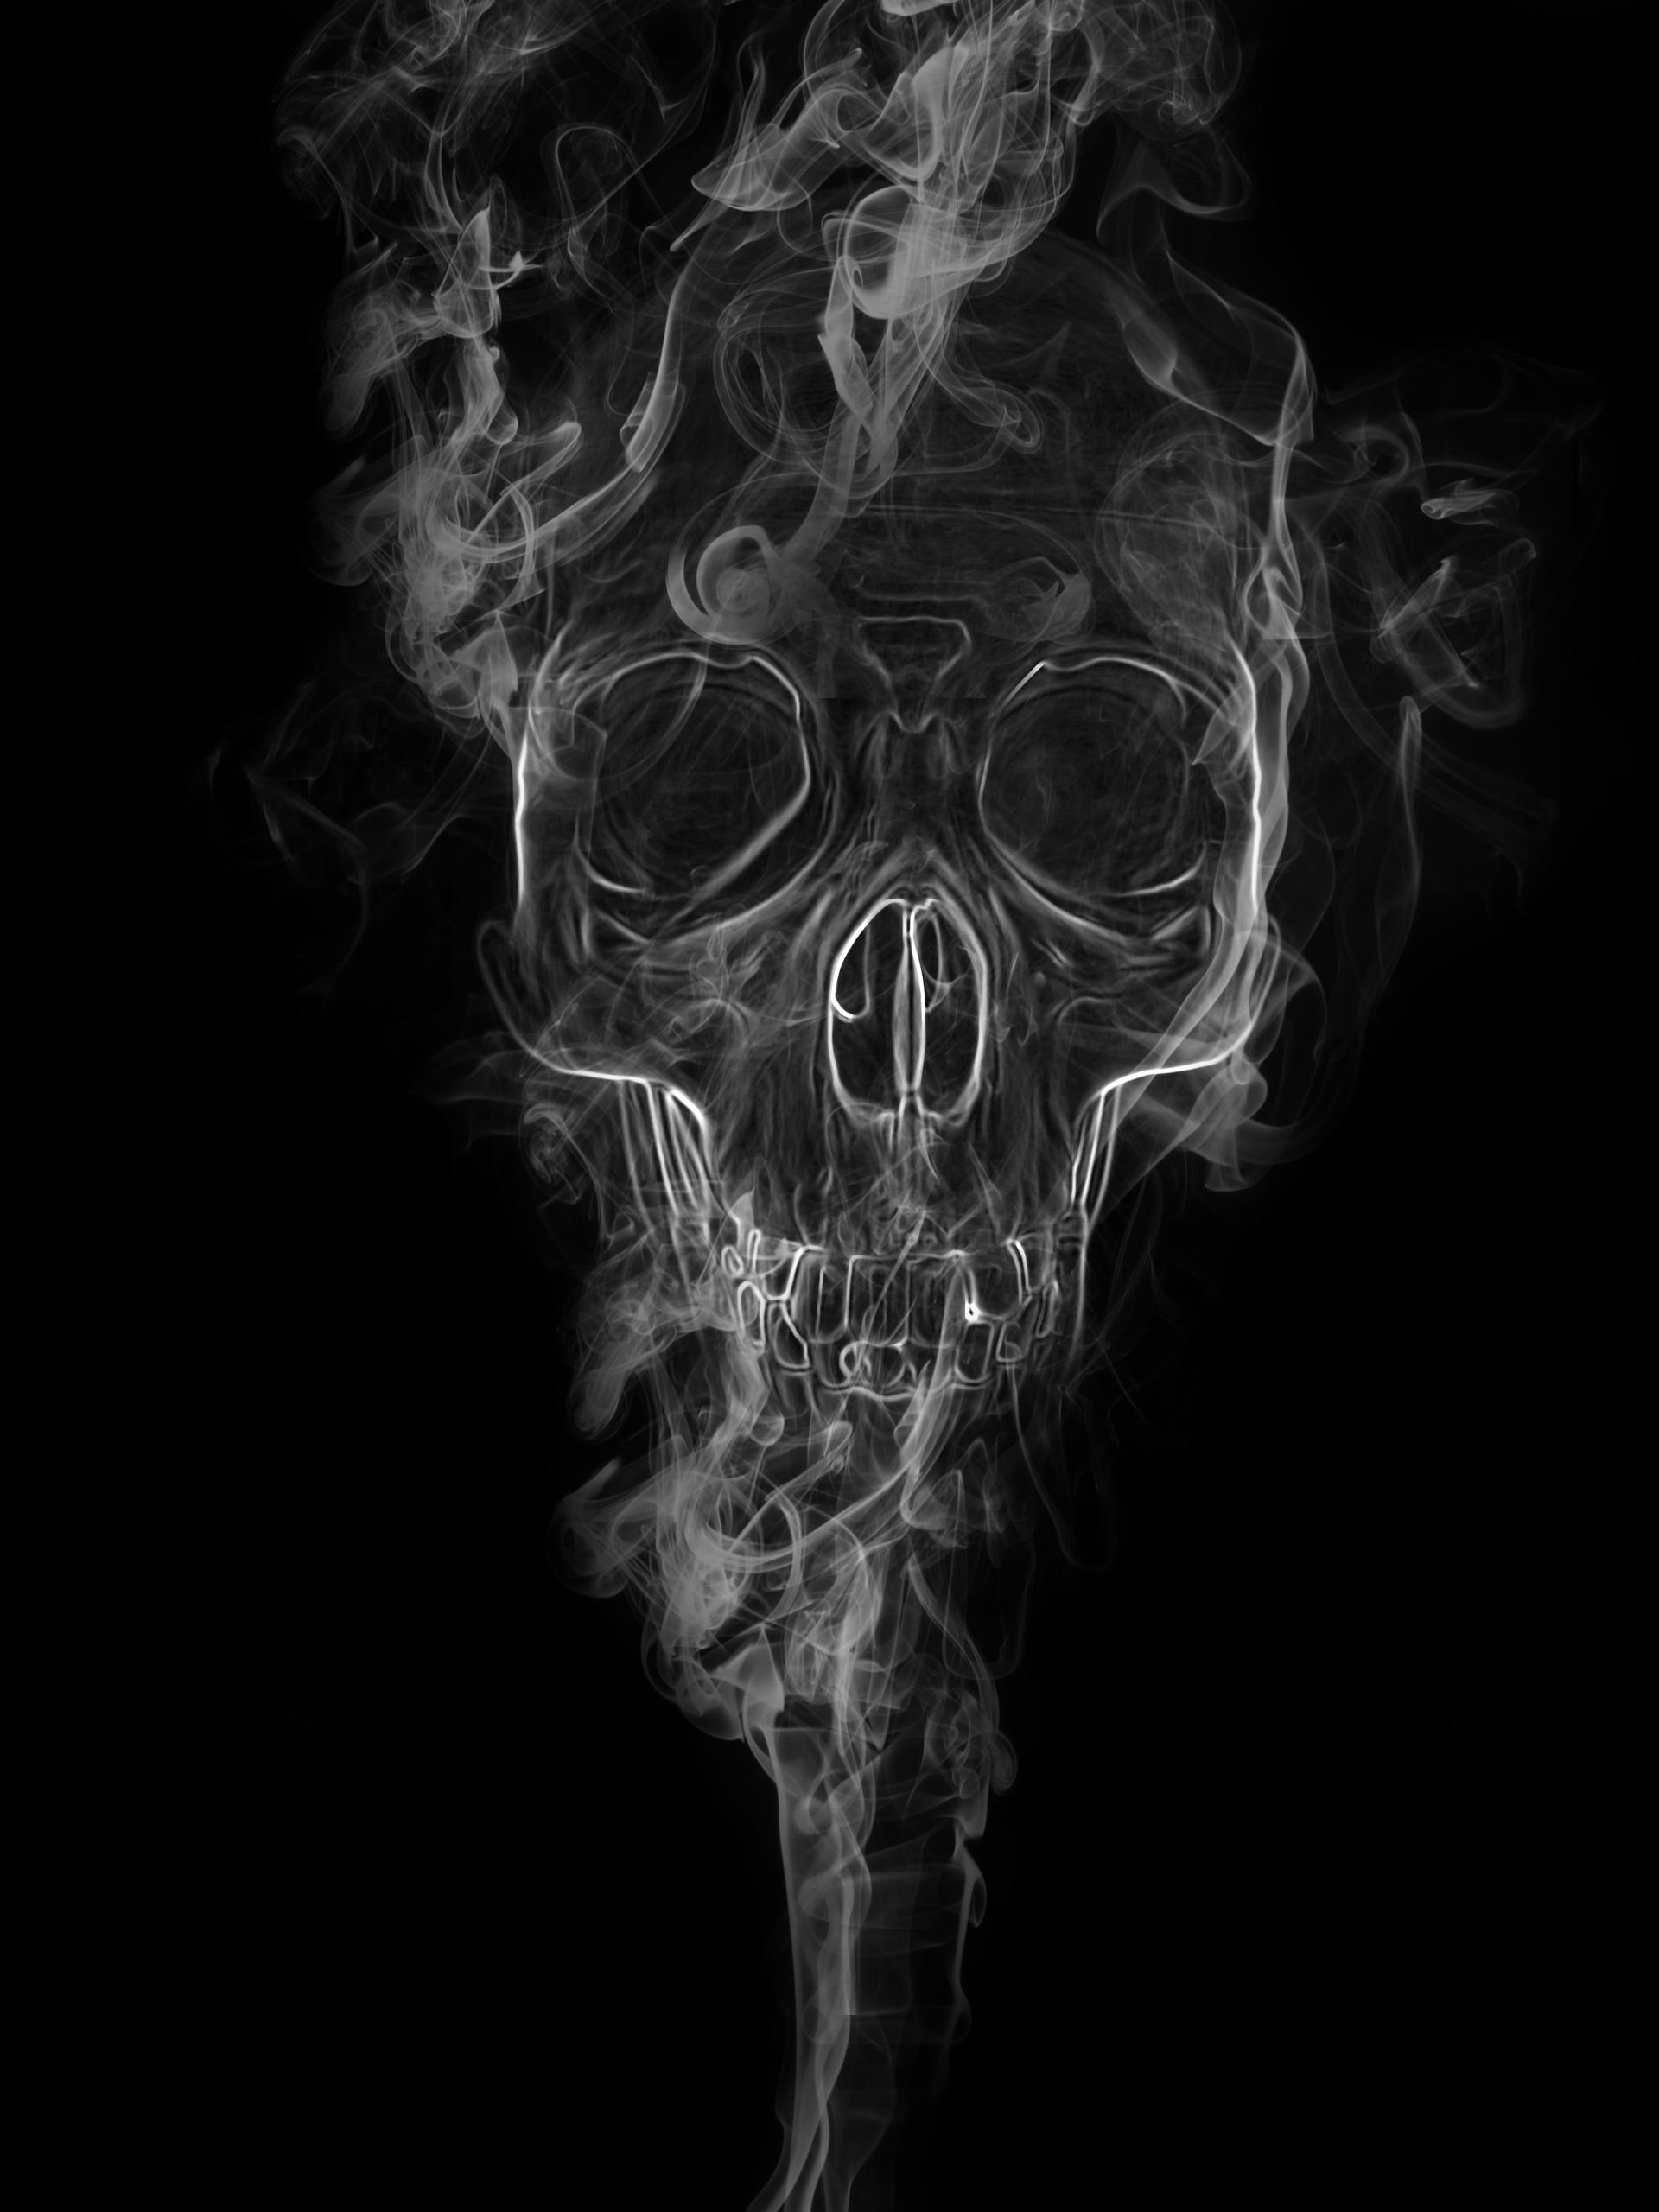 skull in smoke by toinouANDRE on DeviantArt